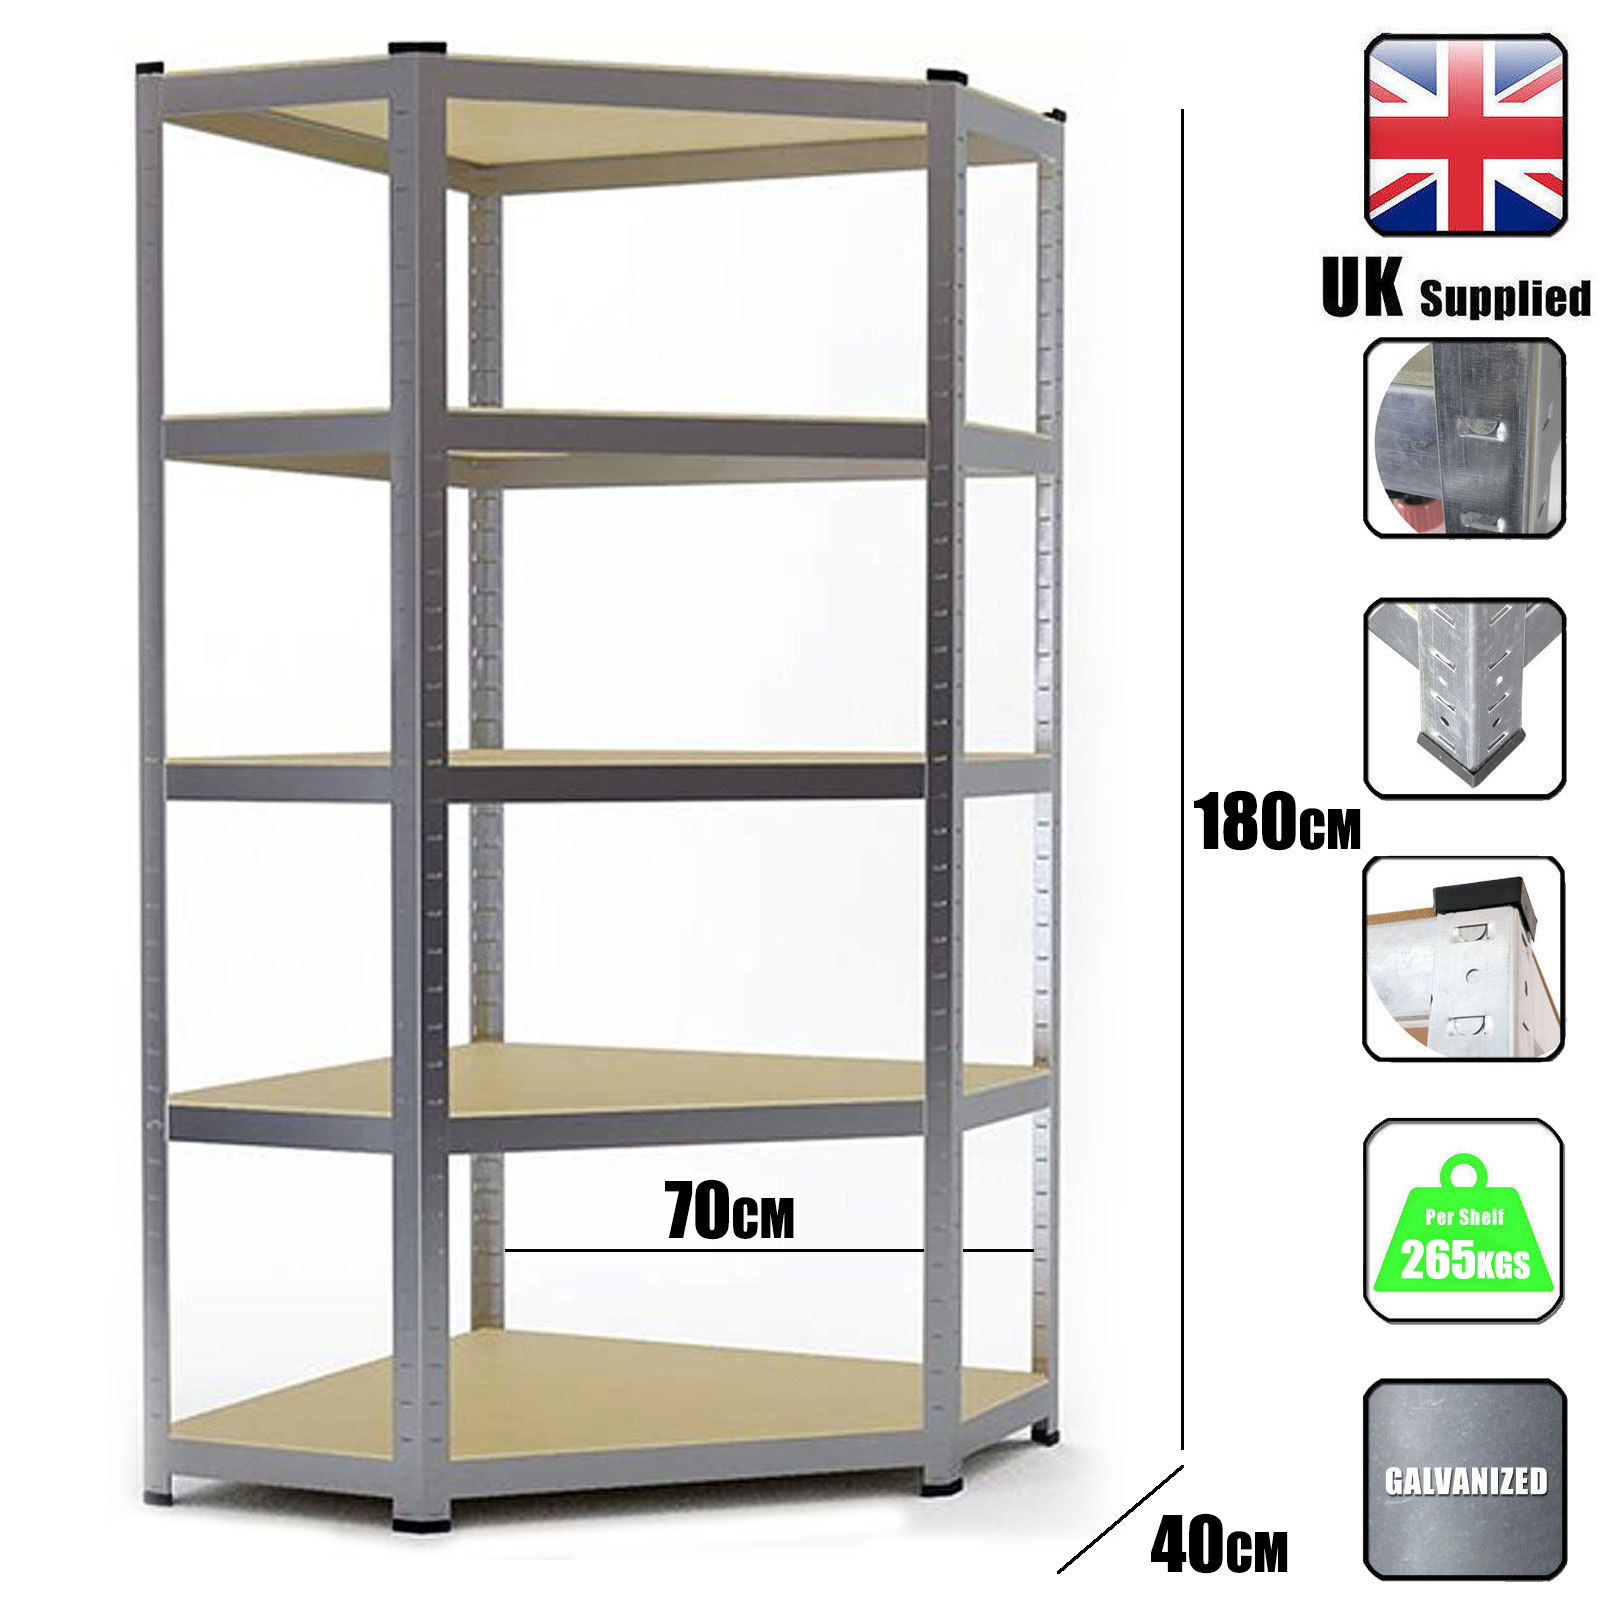 Details About Metal Shelving Industrial Boltless Racking Heavy Duty Corner Shelf Bay 5 Tier